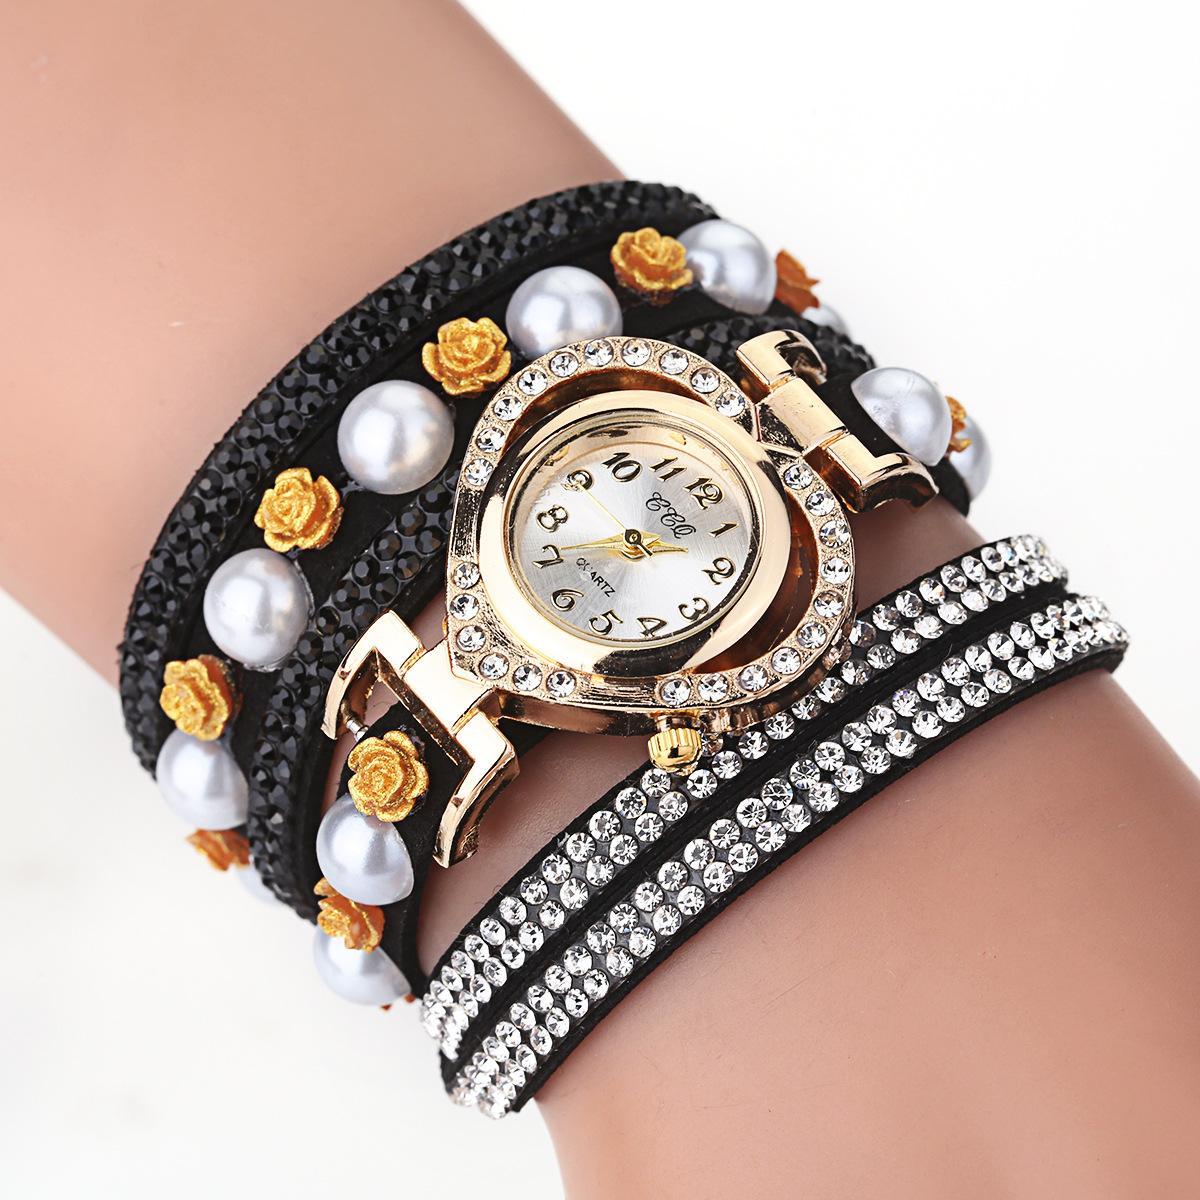 Fashion 2020 Women Dress Quartz Wrist Watch Luxury Gold Rhinestone Bracelet Heart-shaped Design Clock Ladies Elegant Reloj Mujer